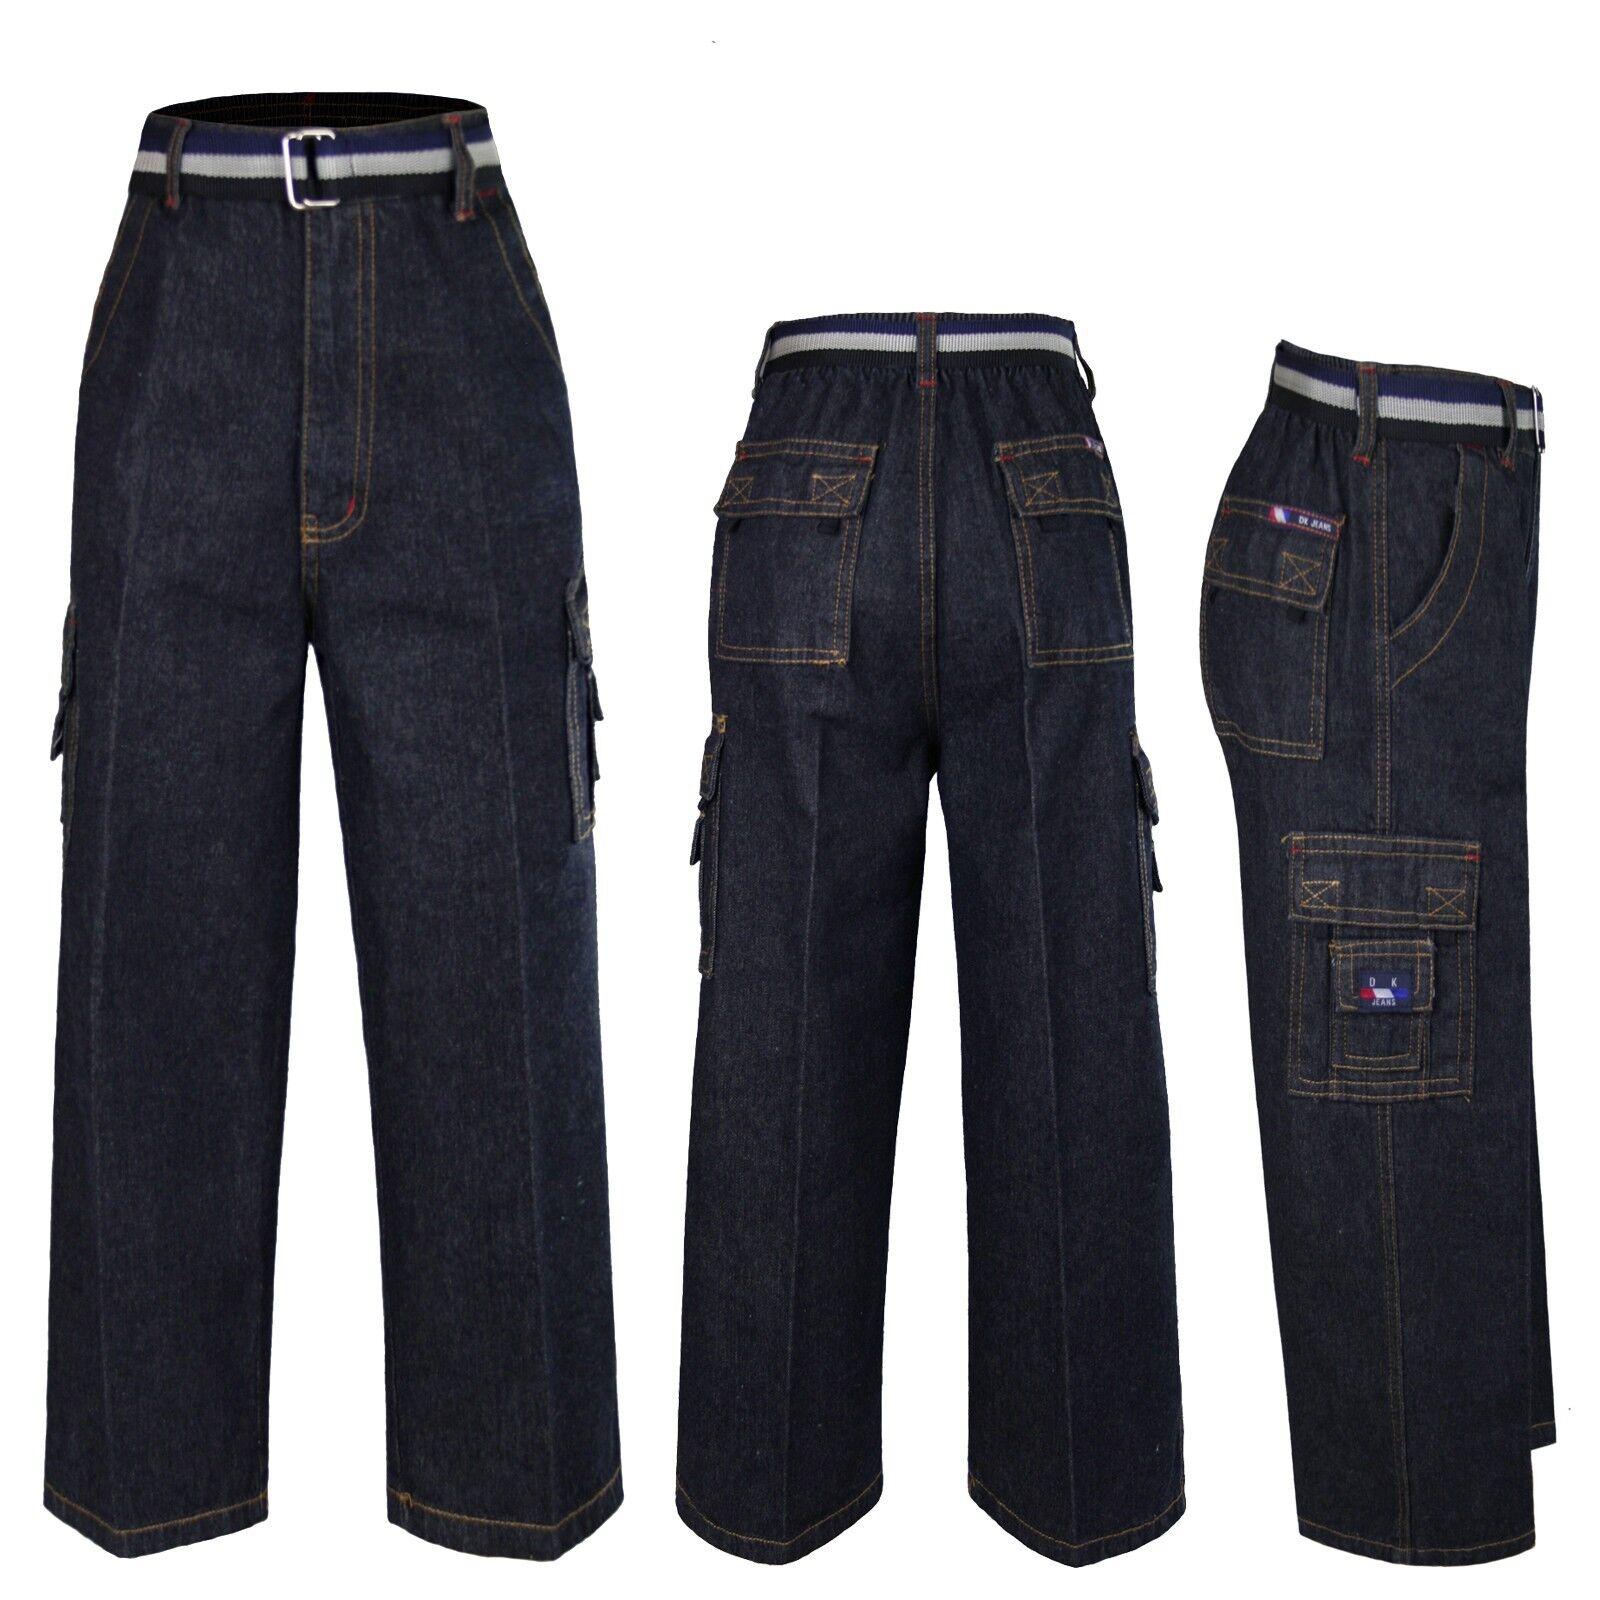 2T-16 Teens Kids Toddler Indigo Denim 8 Pockets Casual Jeans